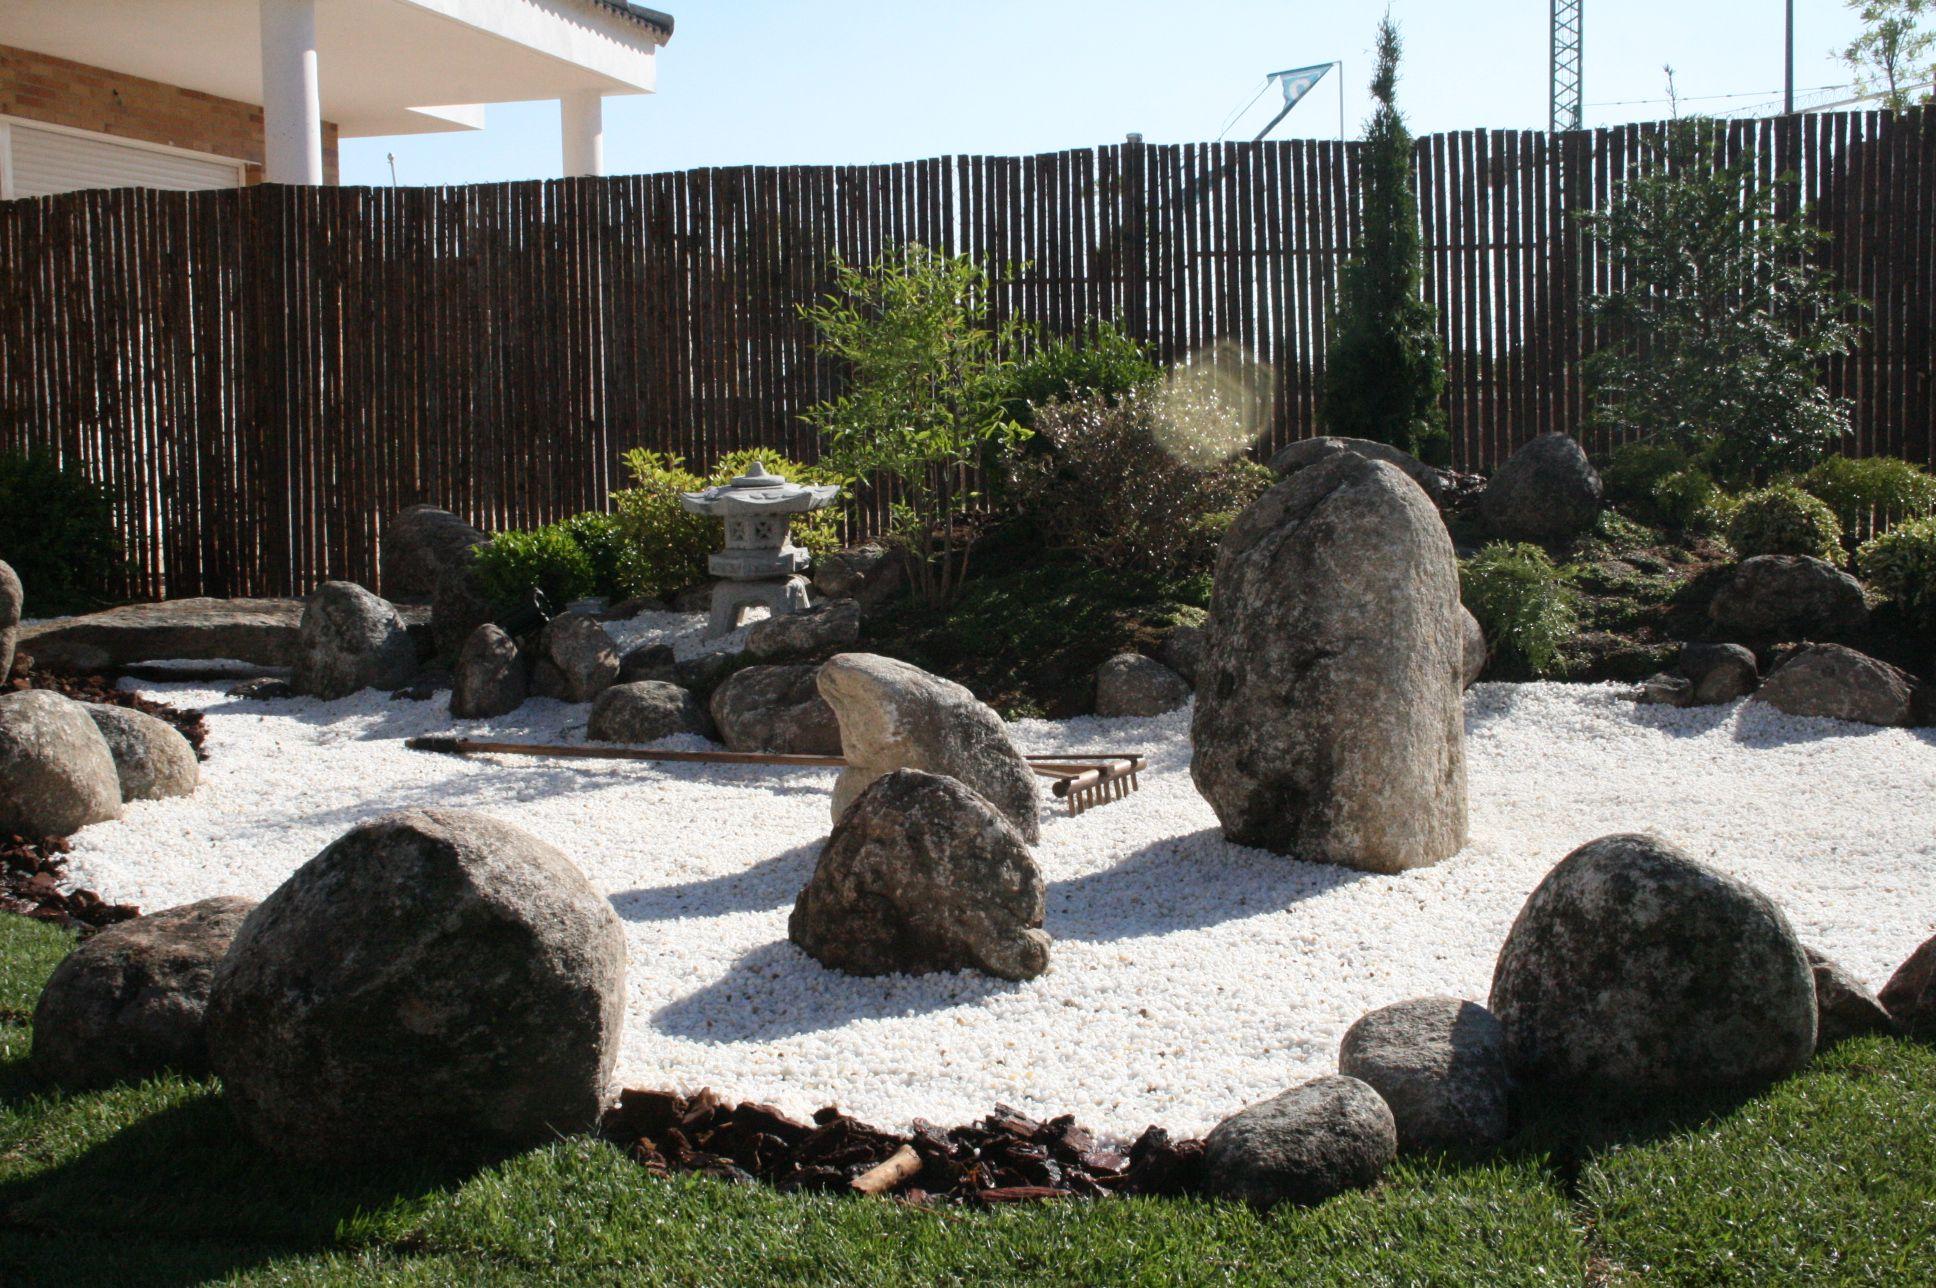 jardin zen en arrroyomolinos madrid jardin japones